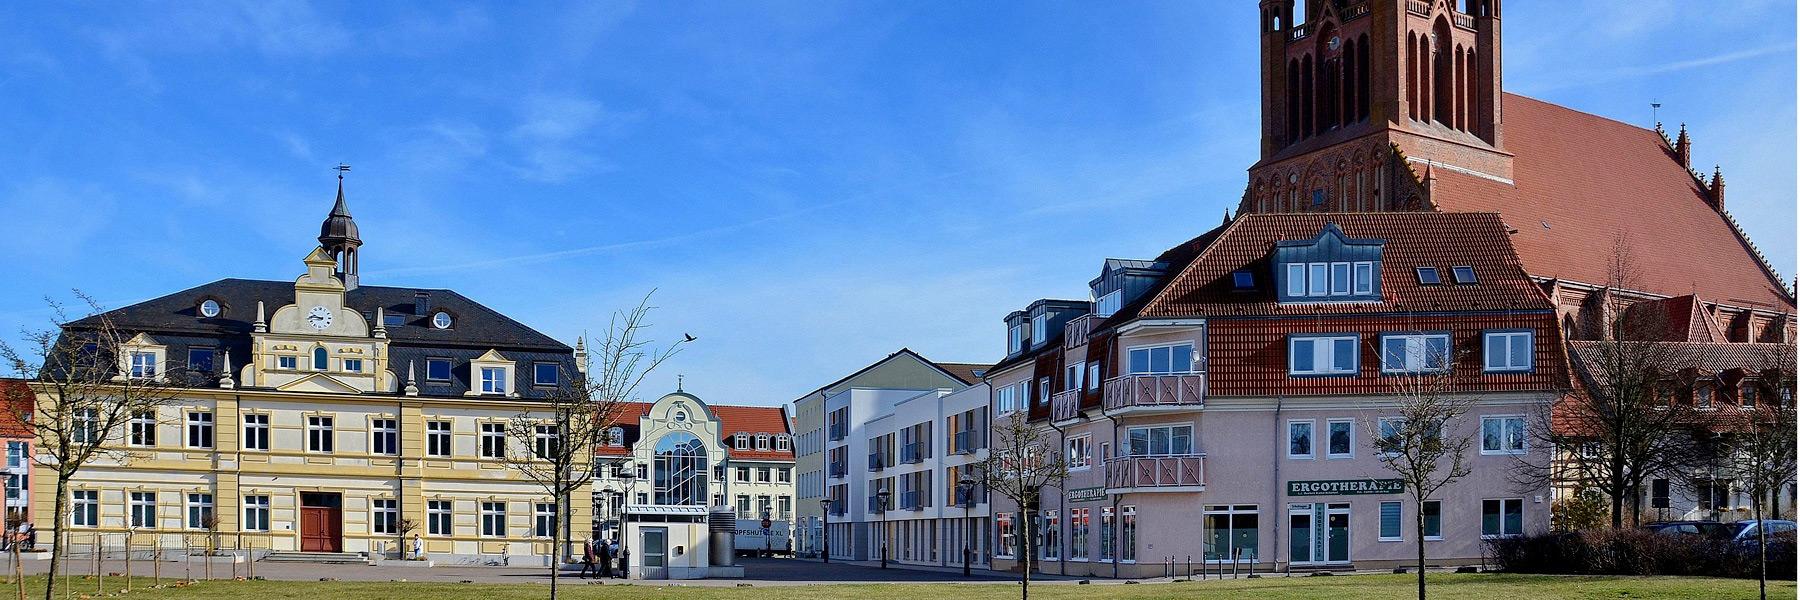 Rathaus & Kirche - Stadtinformation Hansestadt Demmin